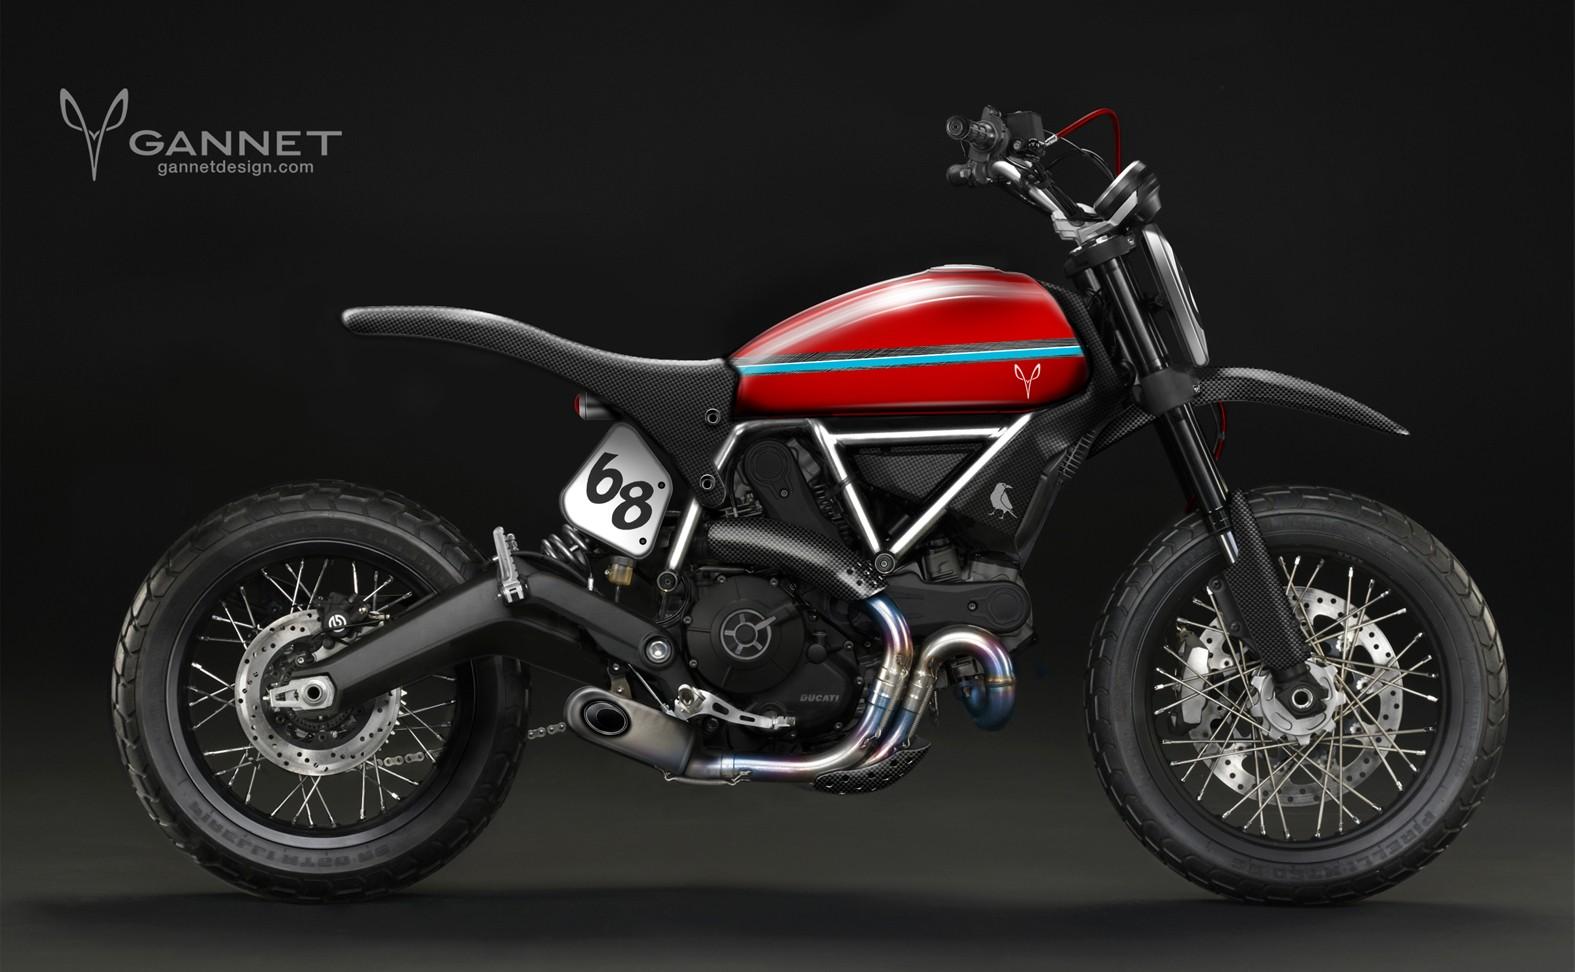 New Ducati Scrambler Concepts Flow In From Gannet Design